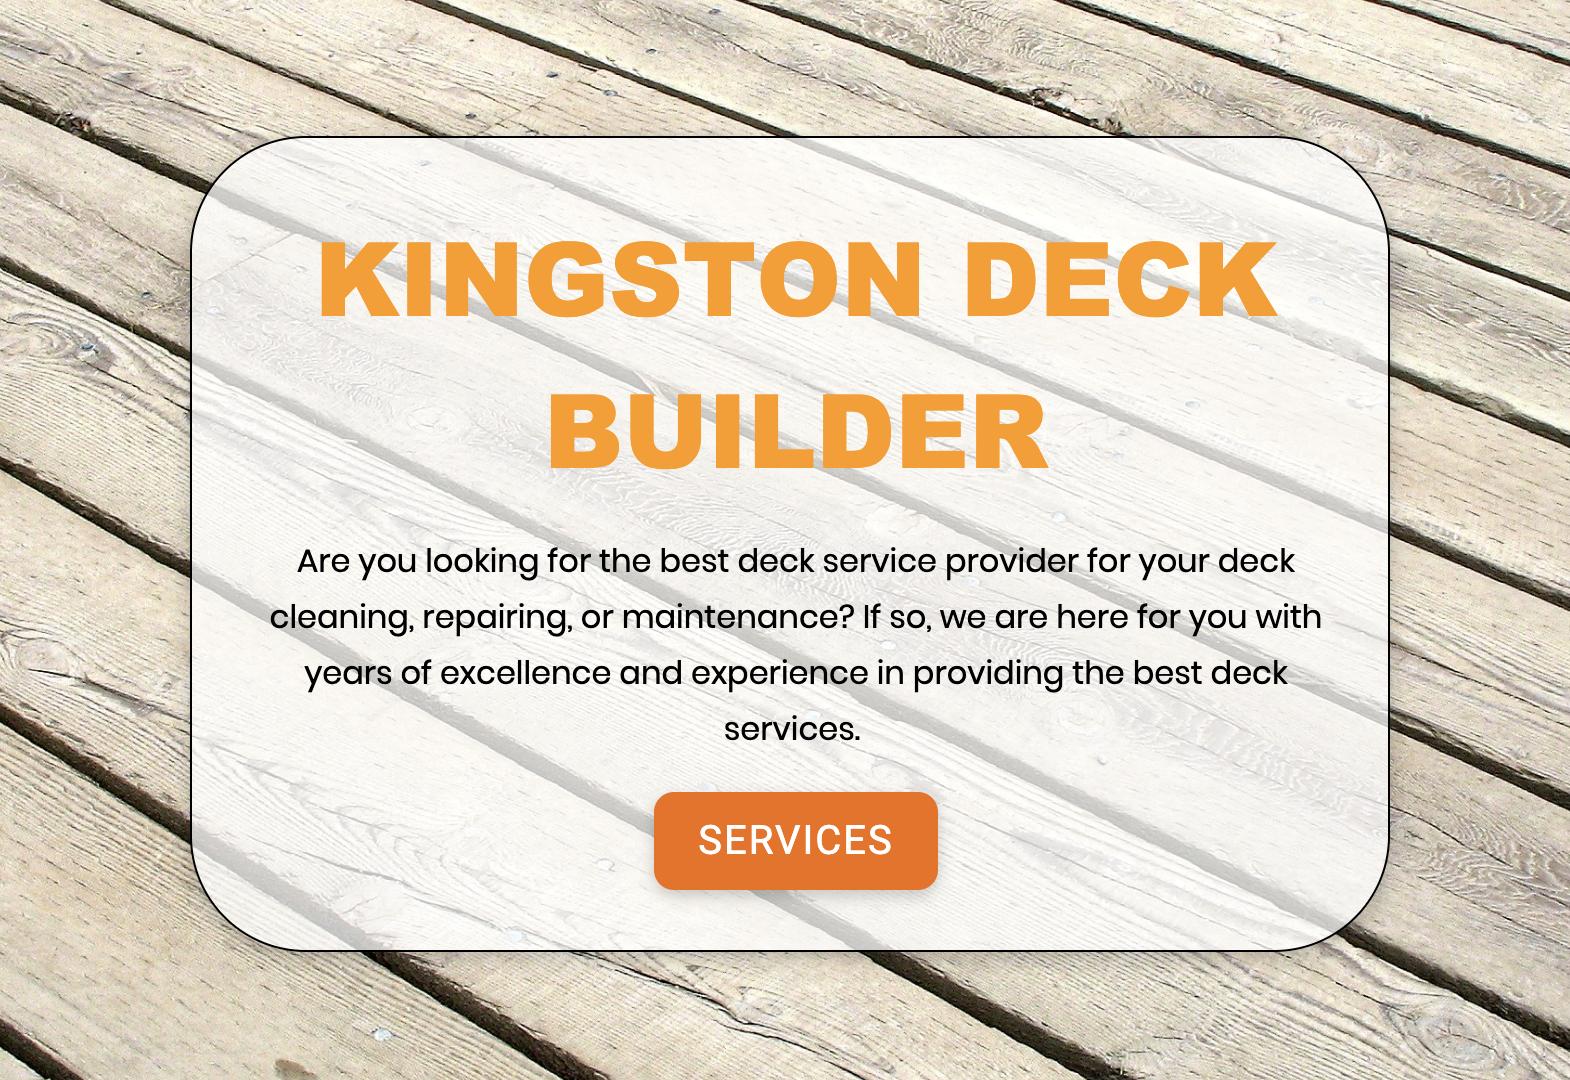 www.kingstondeckbuilder.com